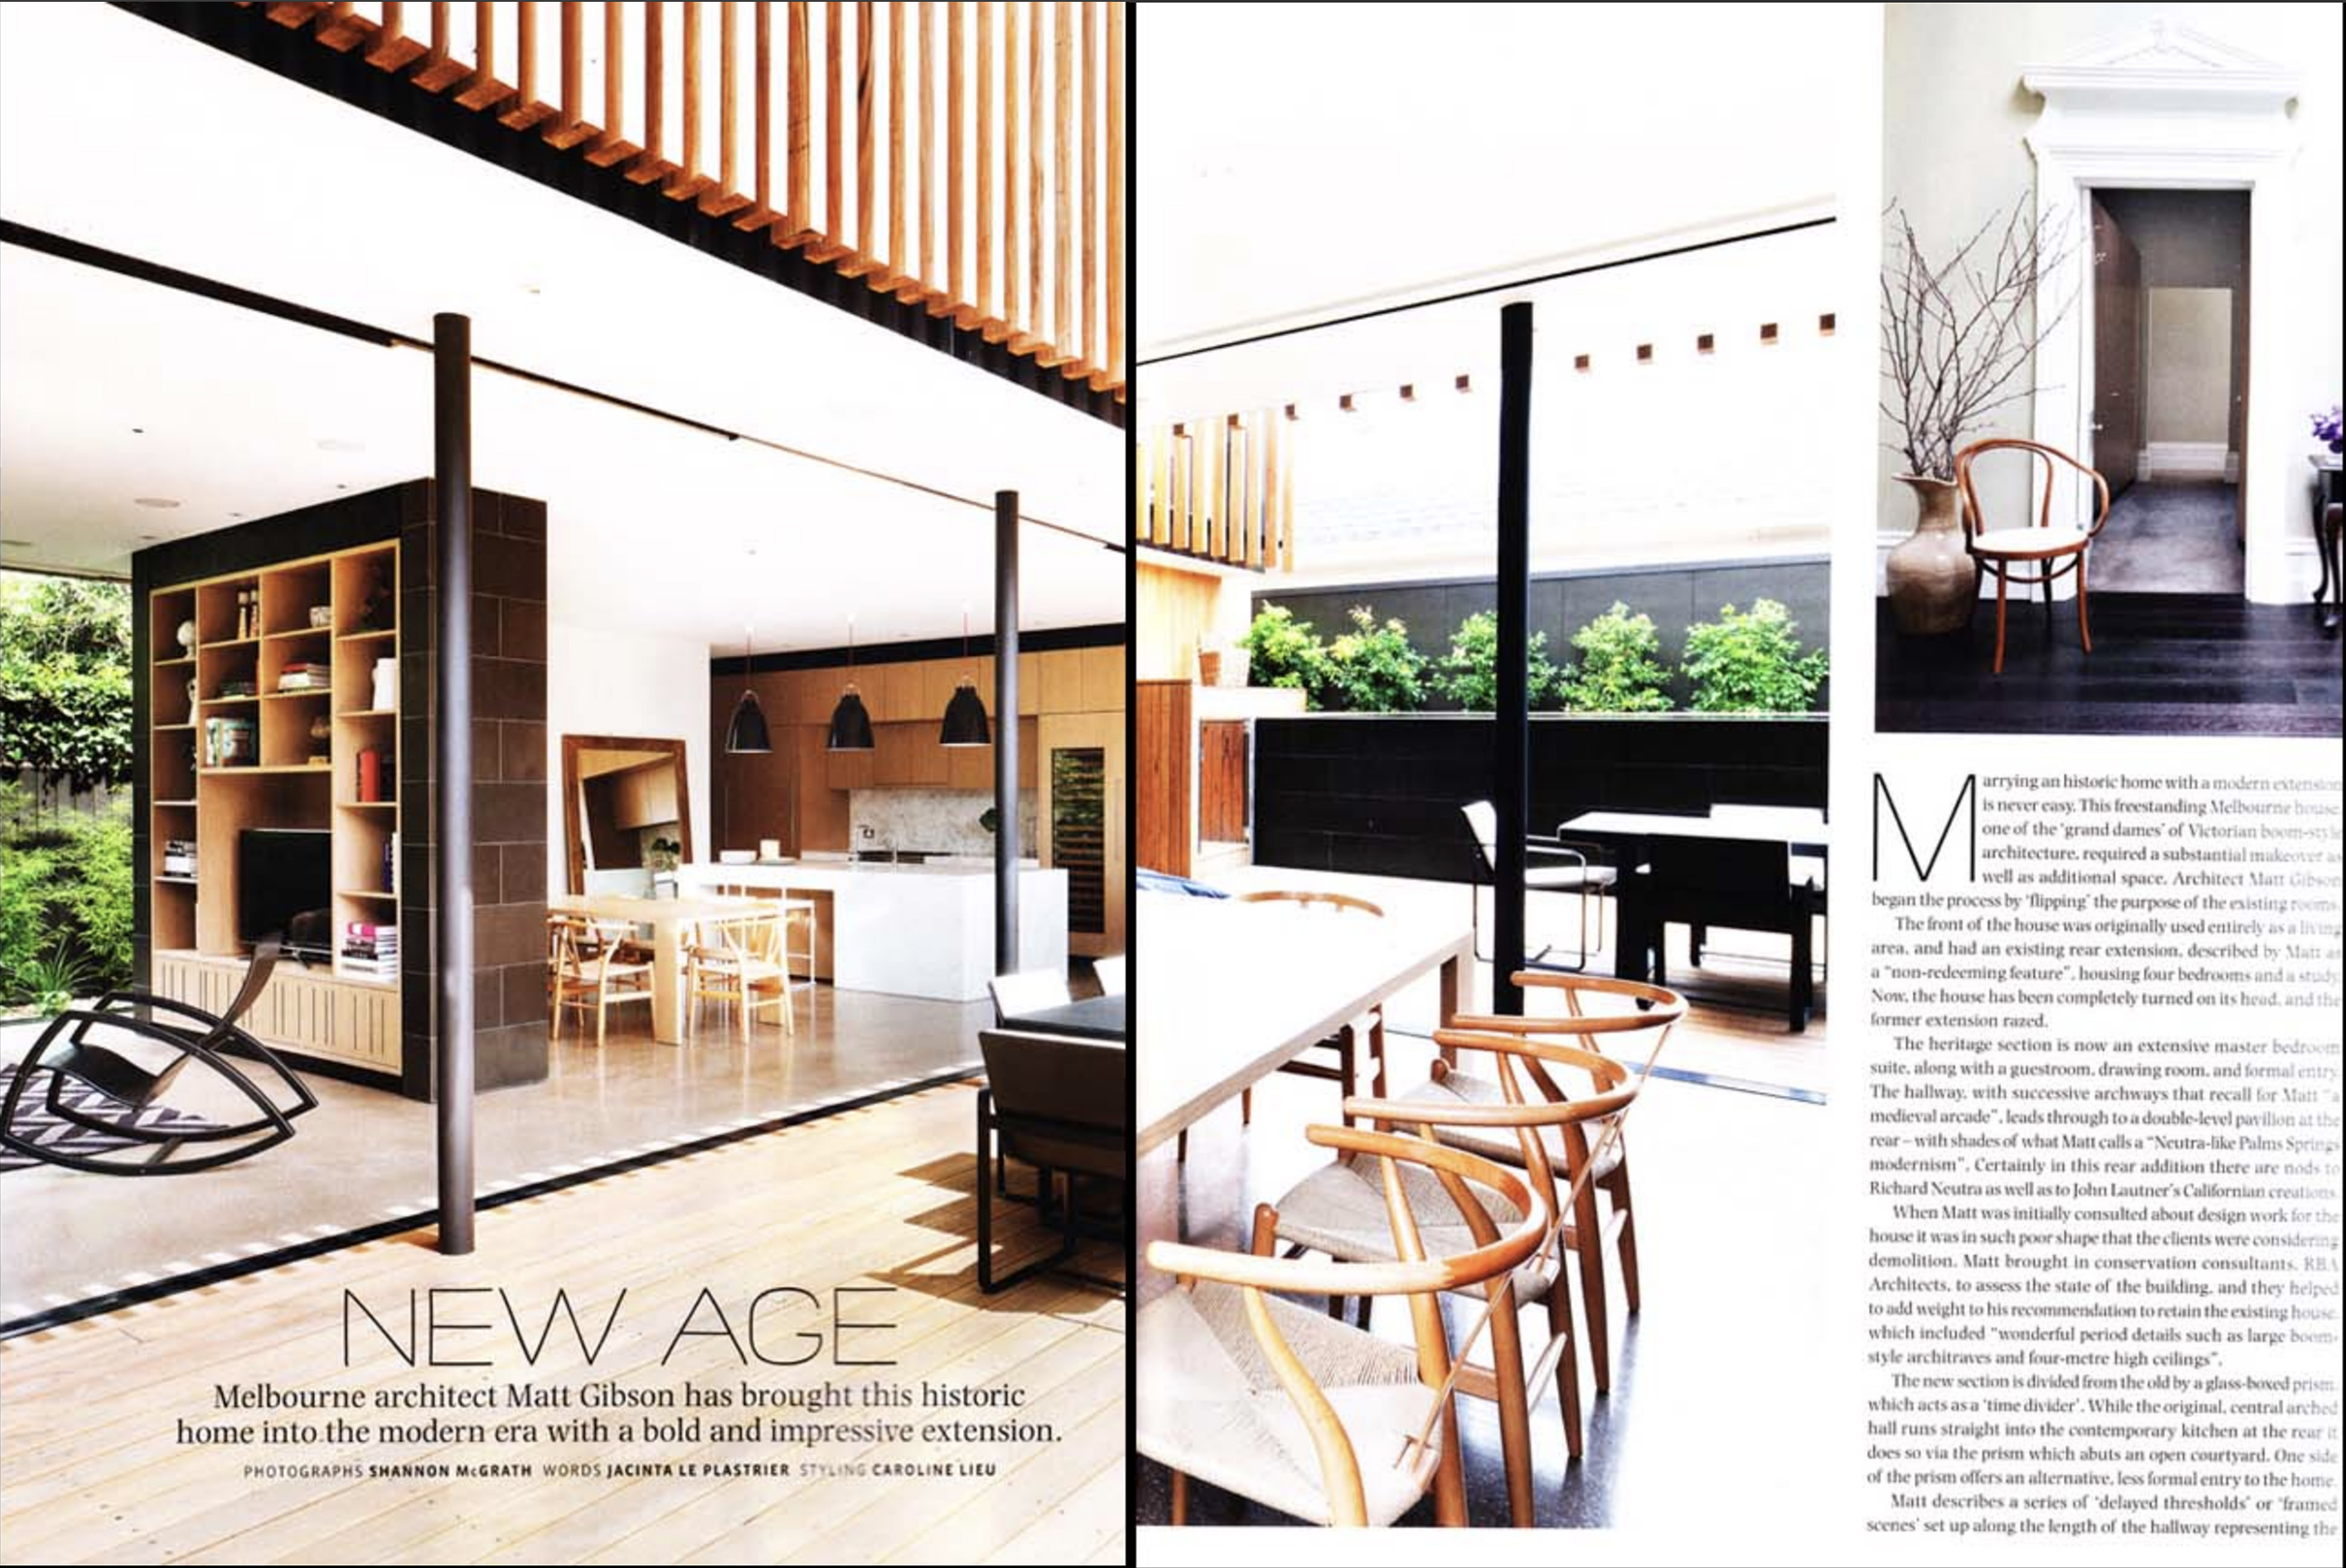 Belle Magazine - Oct/Nov 2012